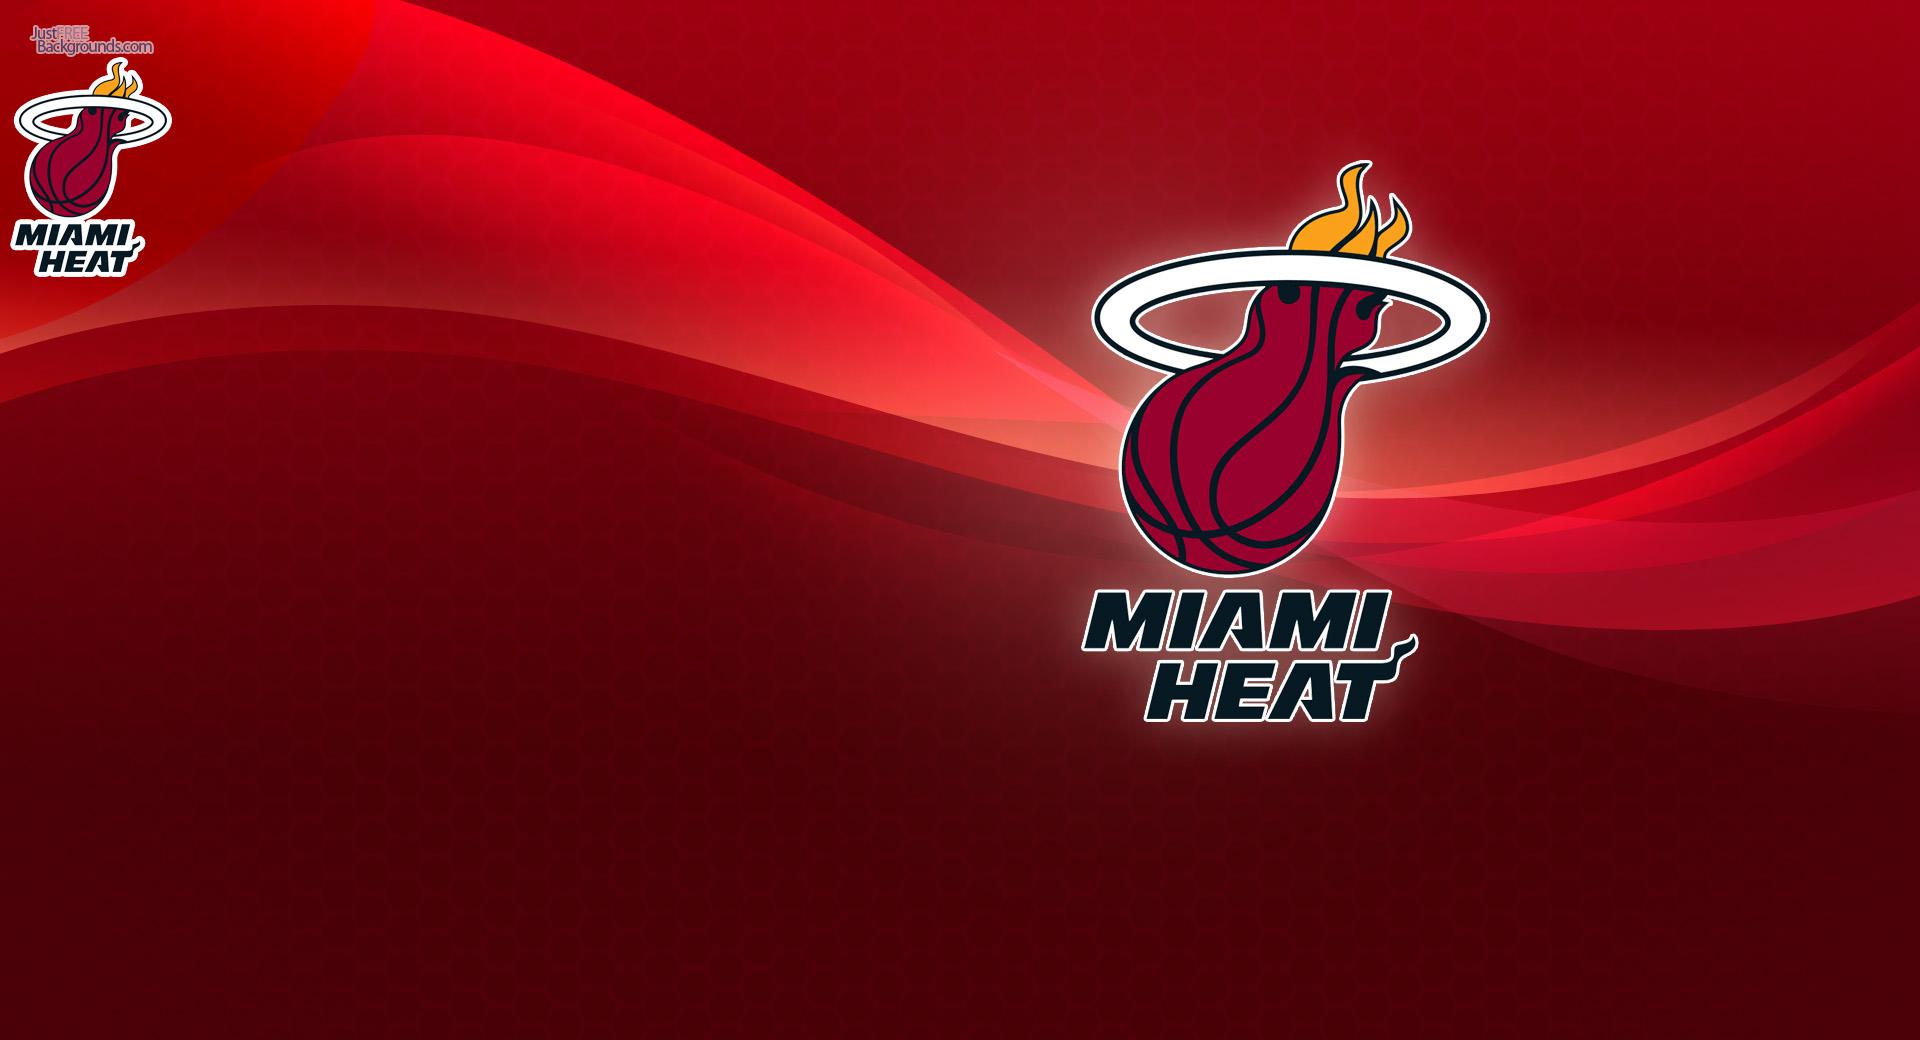 Dwyane Wade Miami Heat Exclusive HD Wallpapers 1764 1920x1040